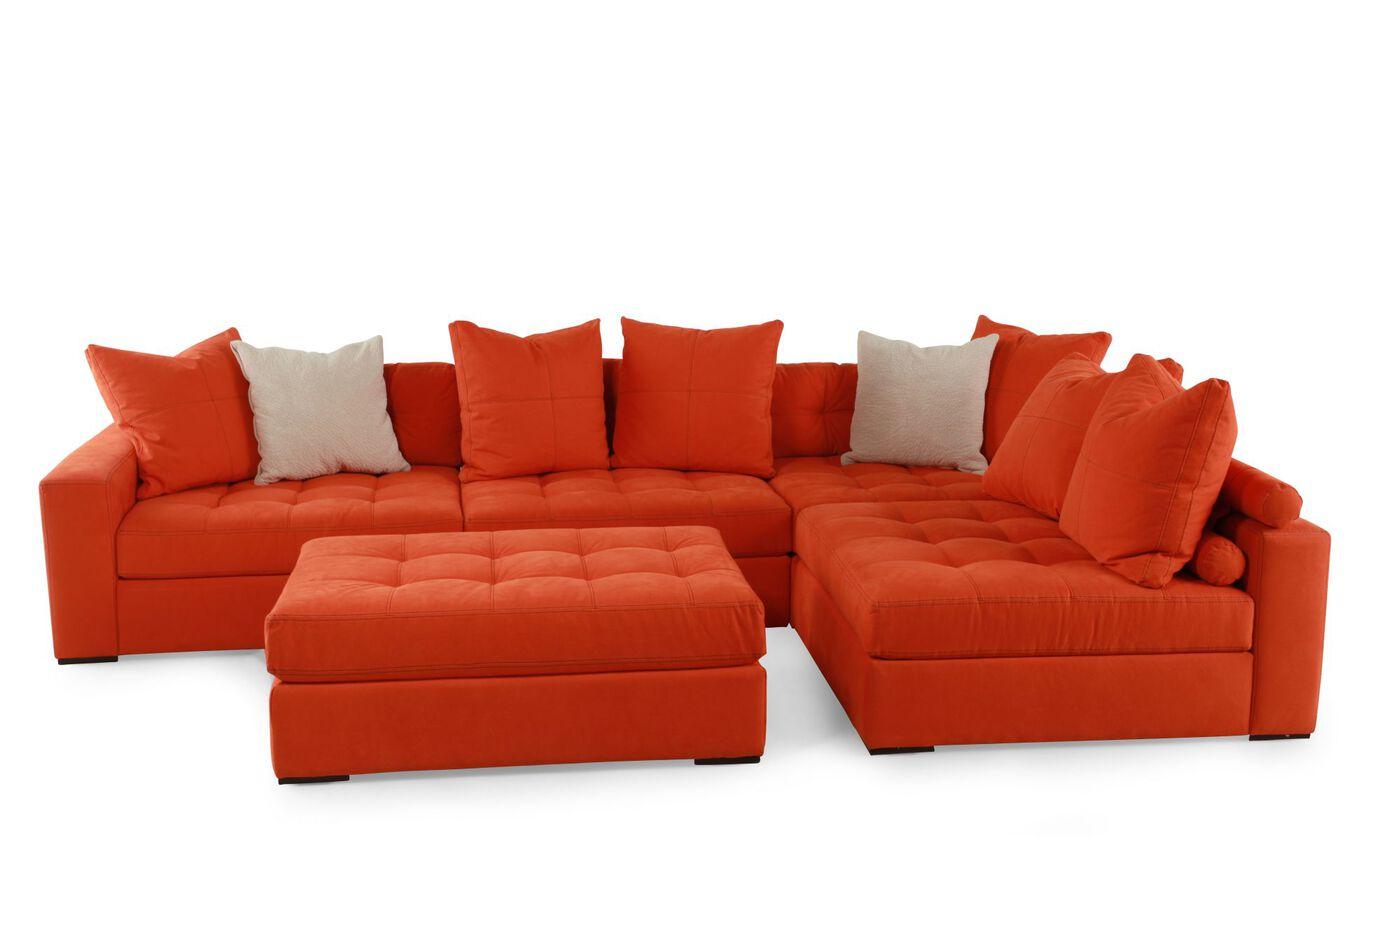 jonathan louis noah orange sectional mathis brothers. Black Bedroom Furniture Sets. Home Design Ideas